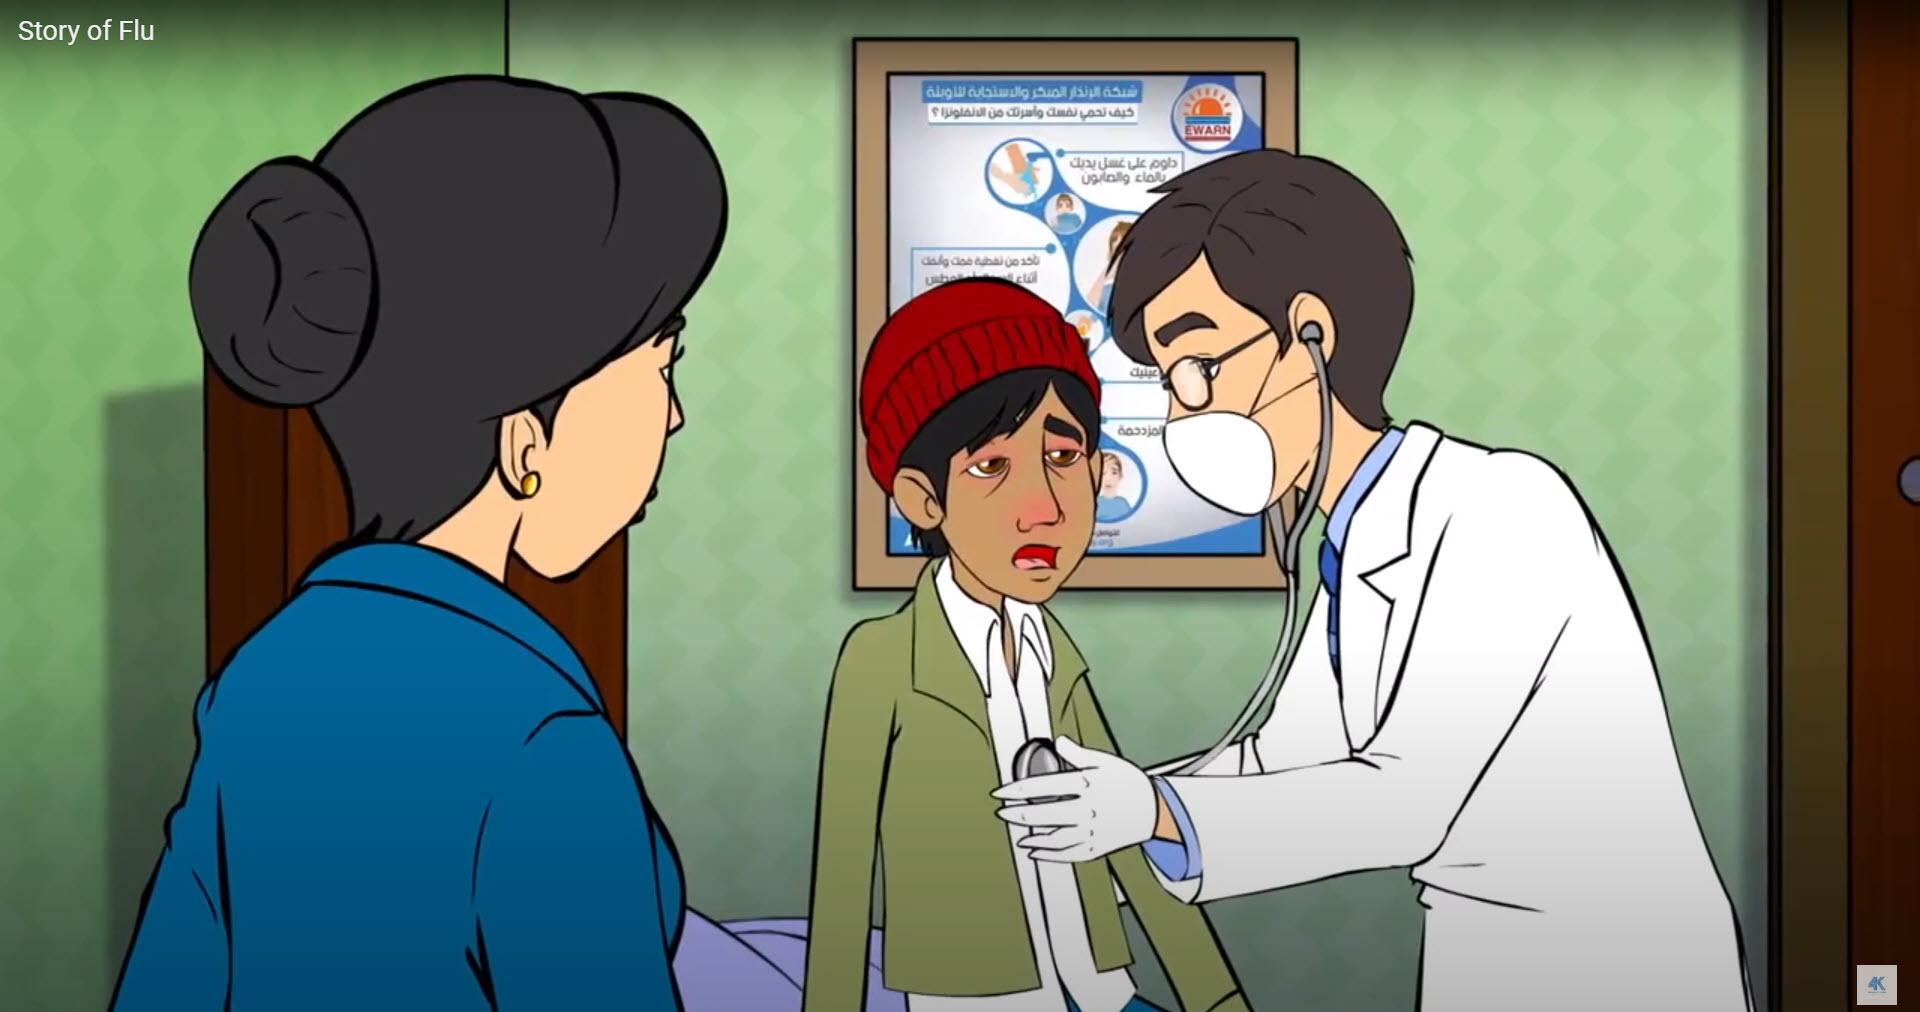 Story of Flu